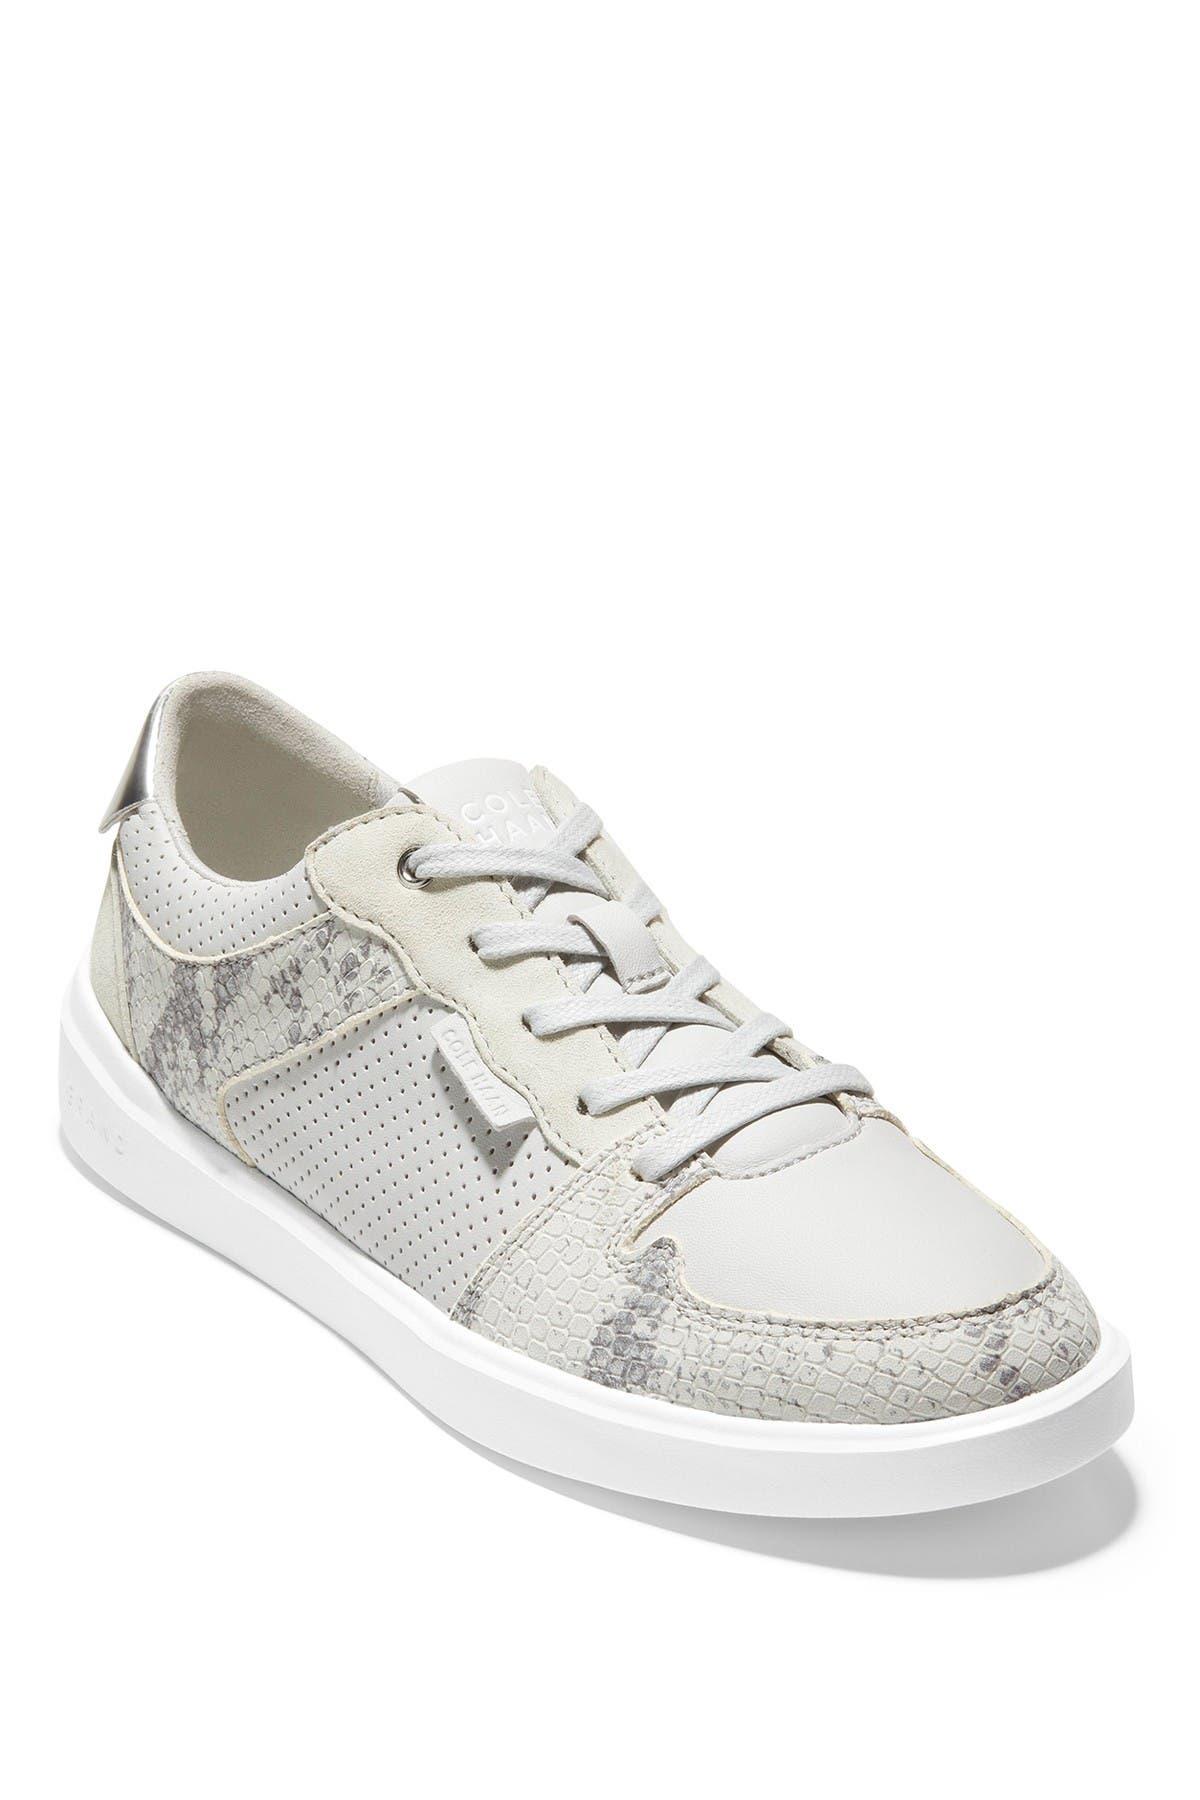 Image of Cole Haan Grand Crosscourt Modern Sneaker